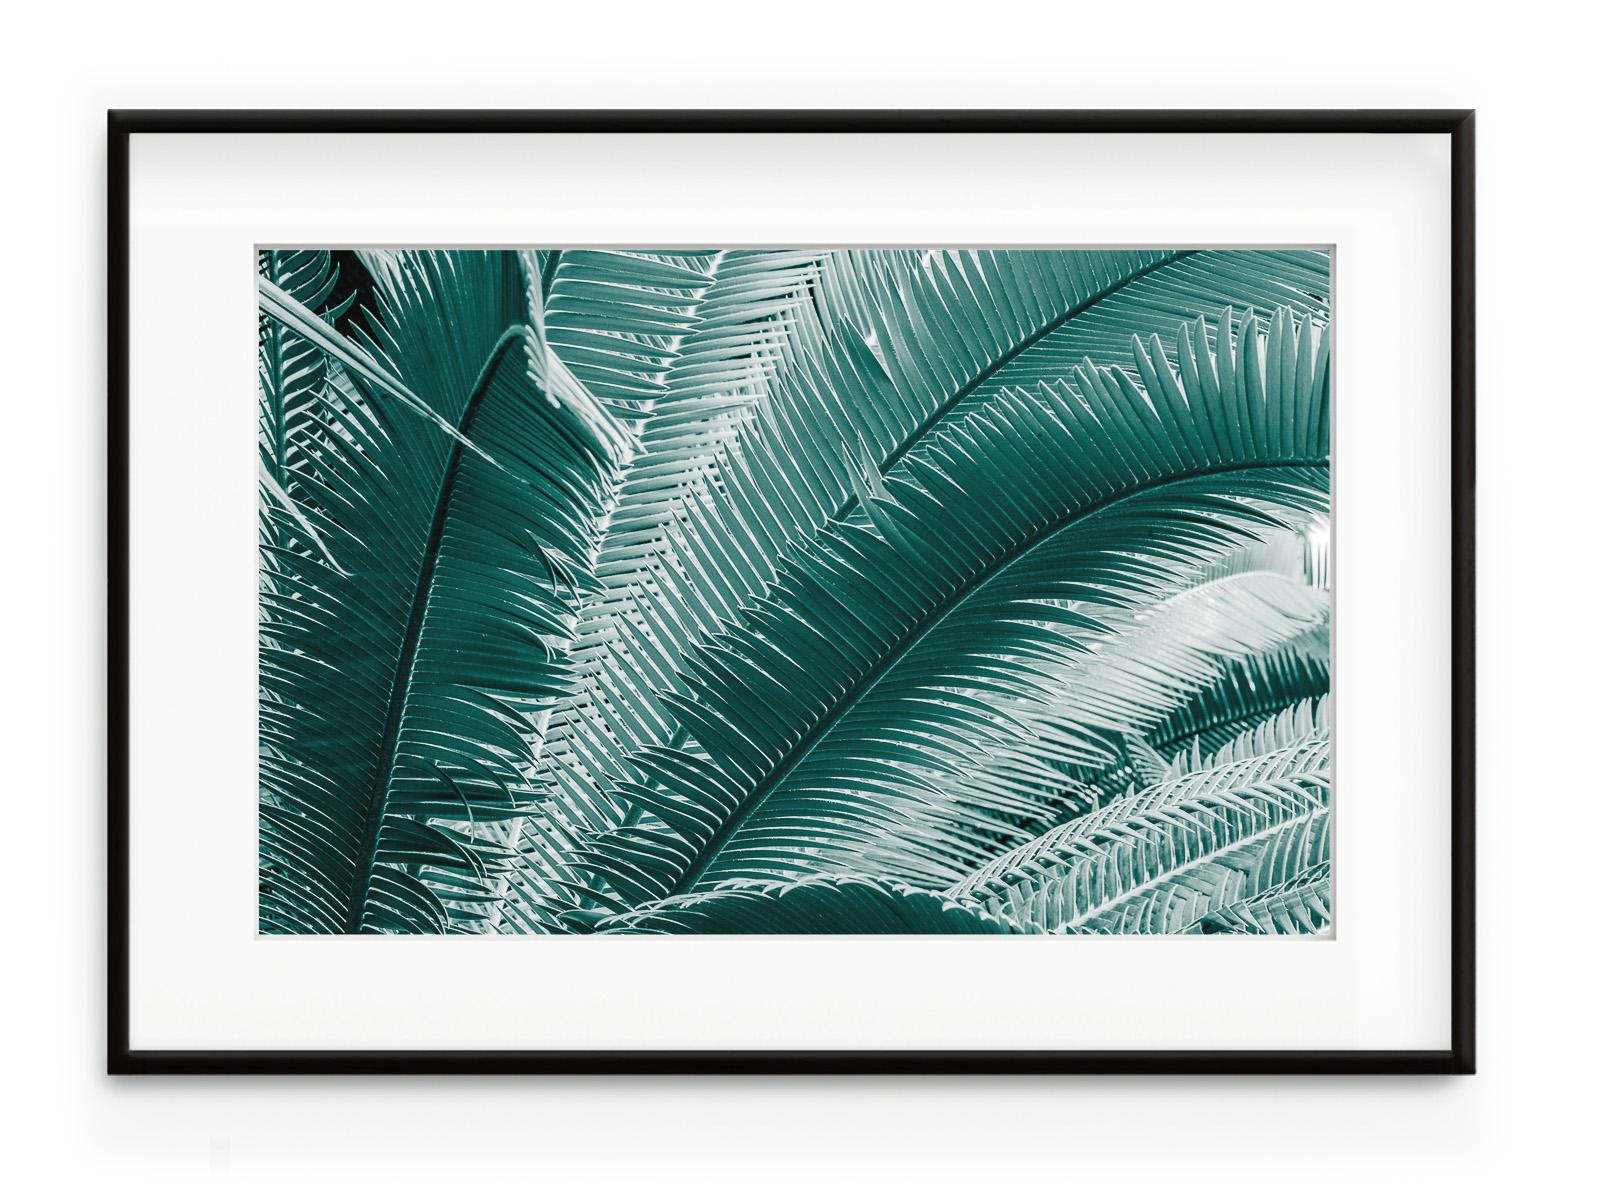 Tablou Palmes Bleues Aluminium Noir